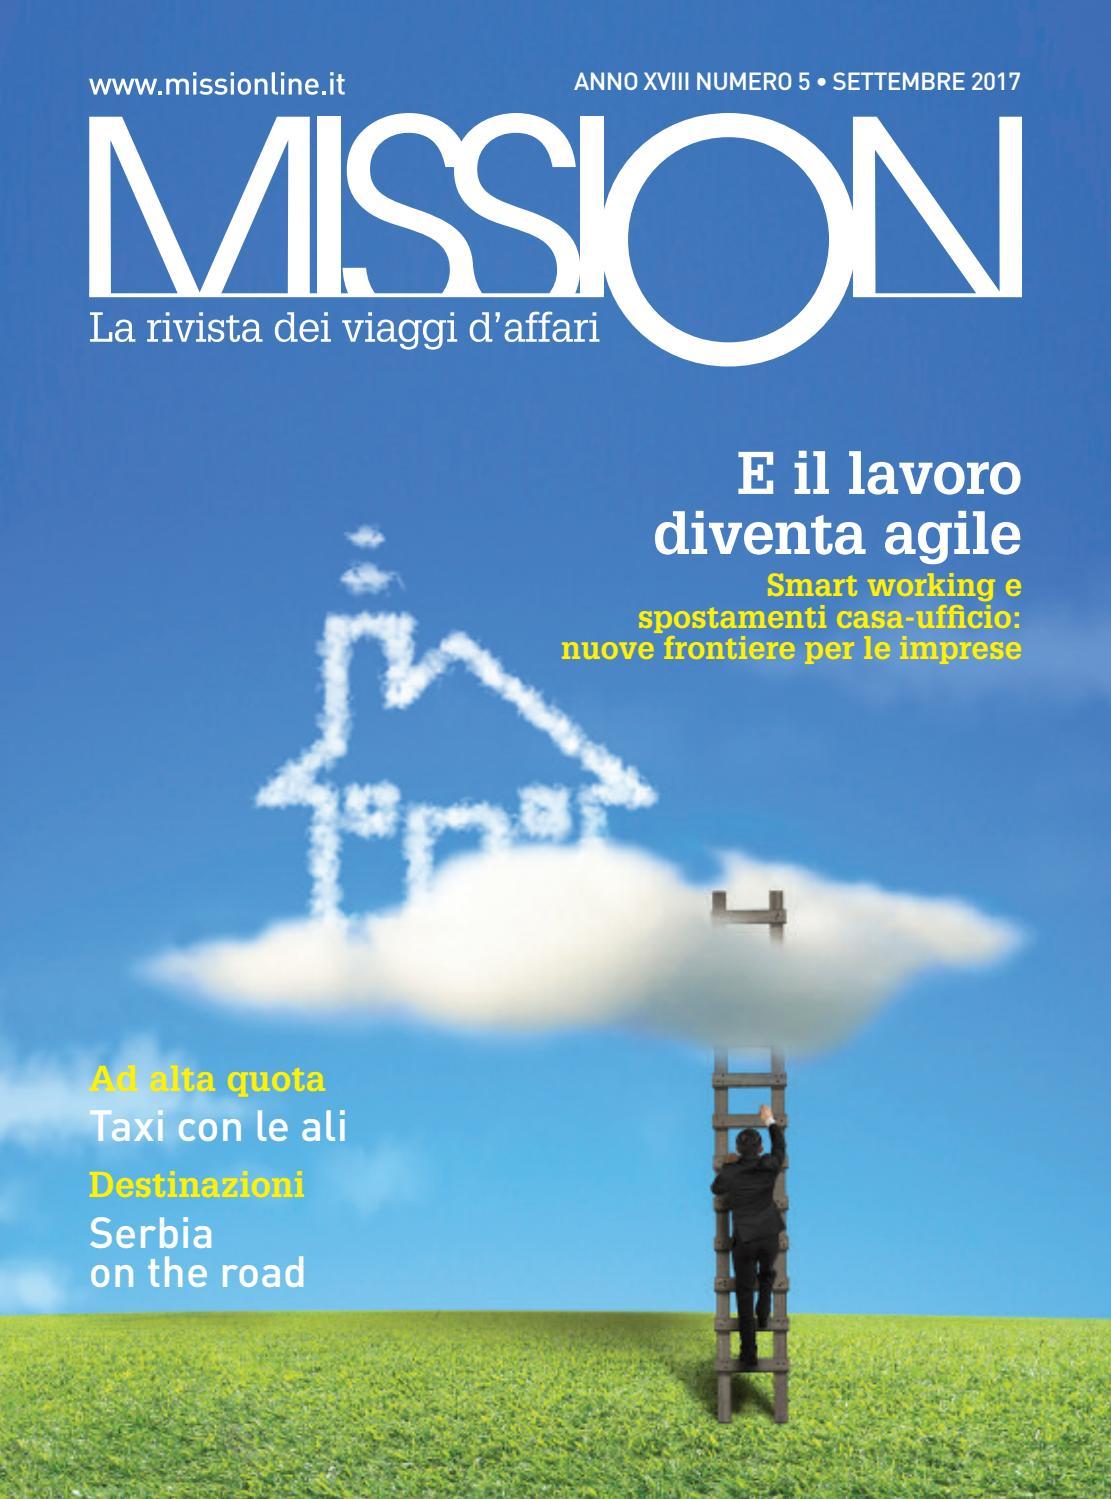 Hilton Catania Capomulini Lavoro mission 5 - 2017 by newsteca - issuu